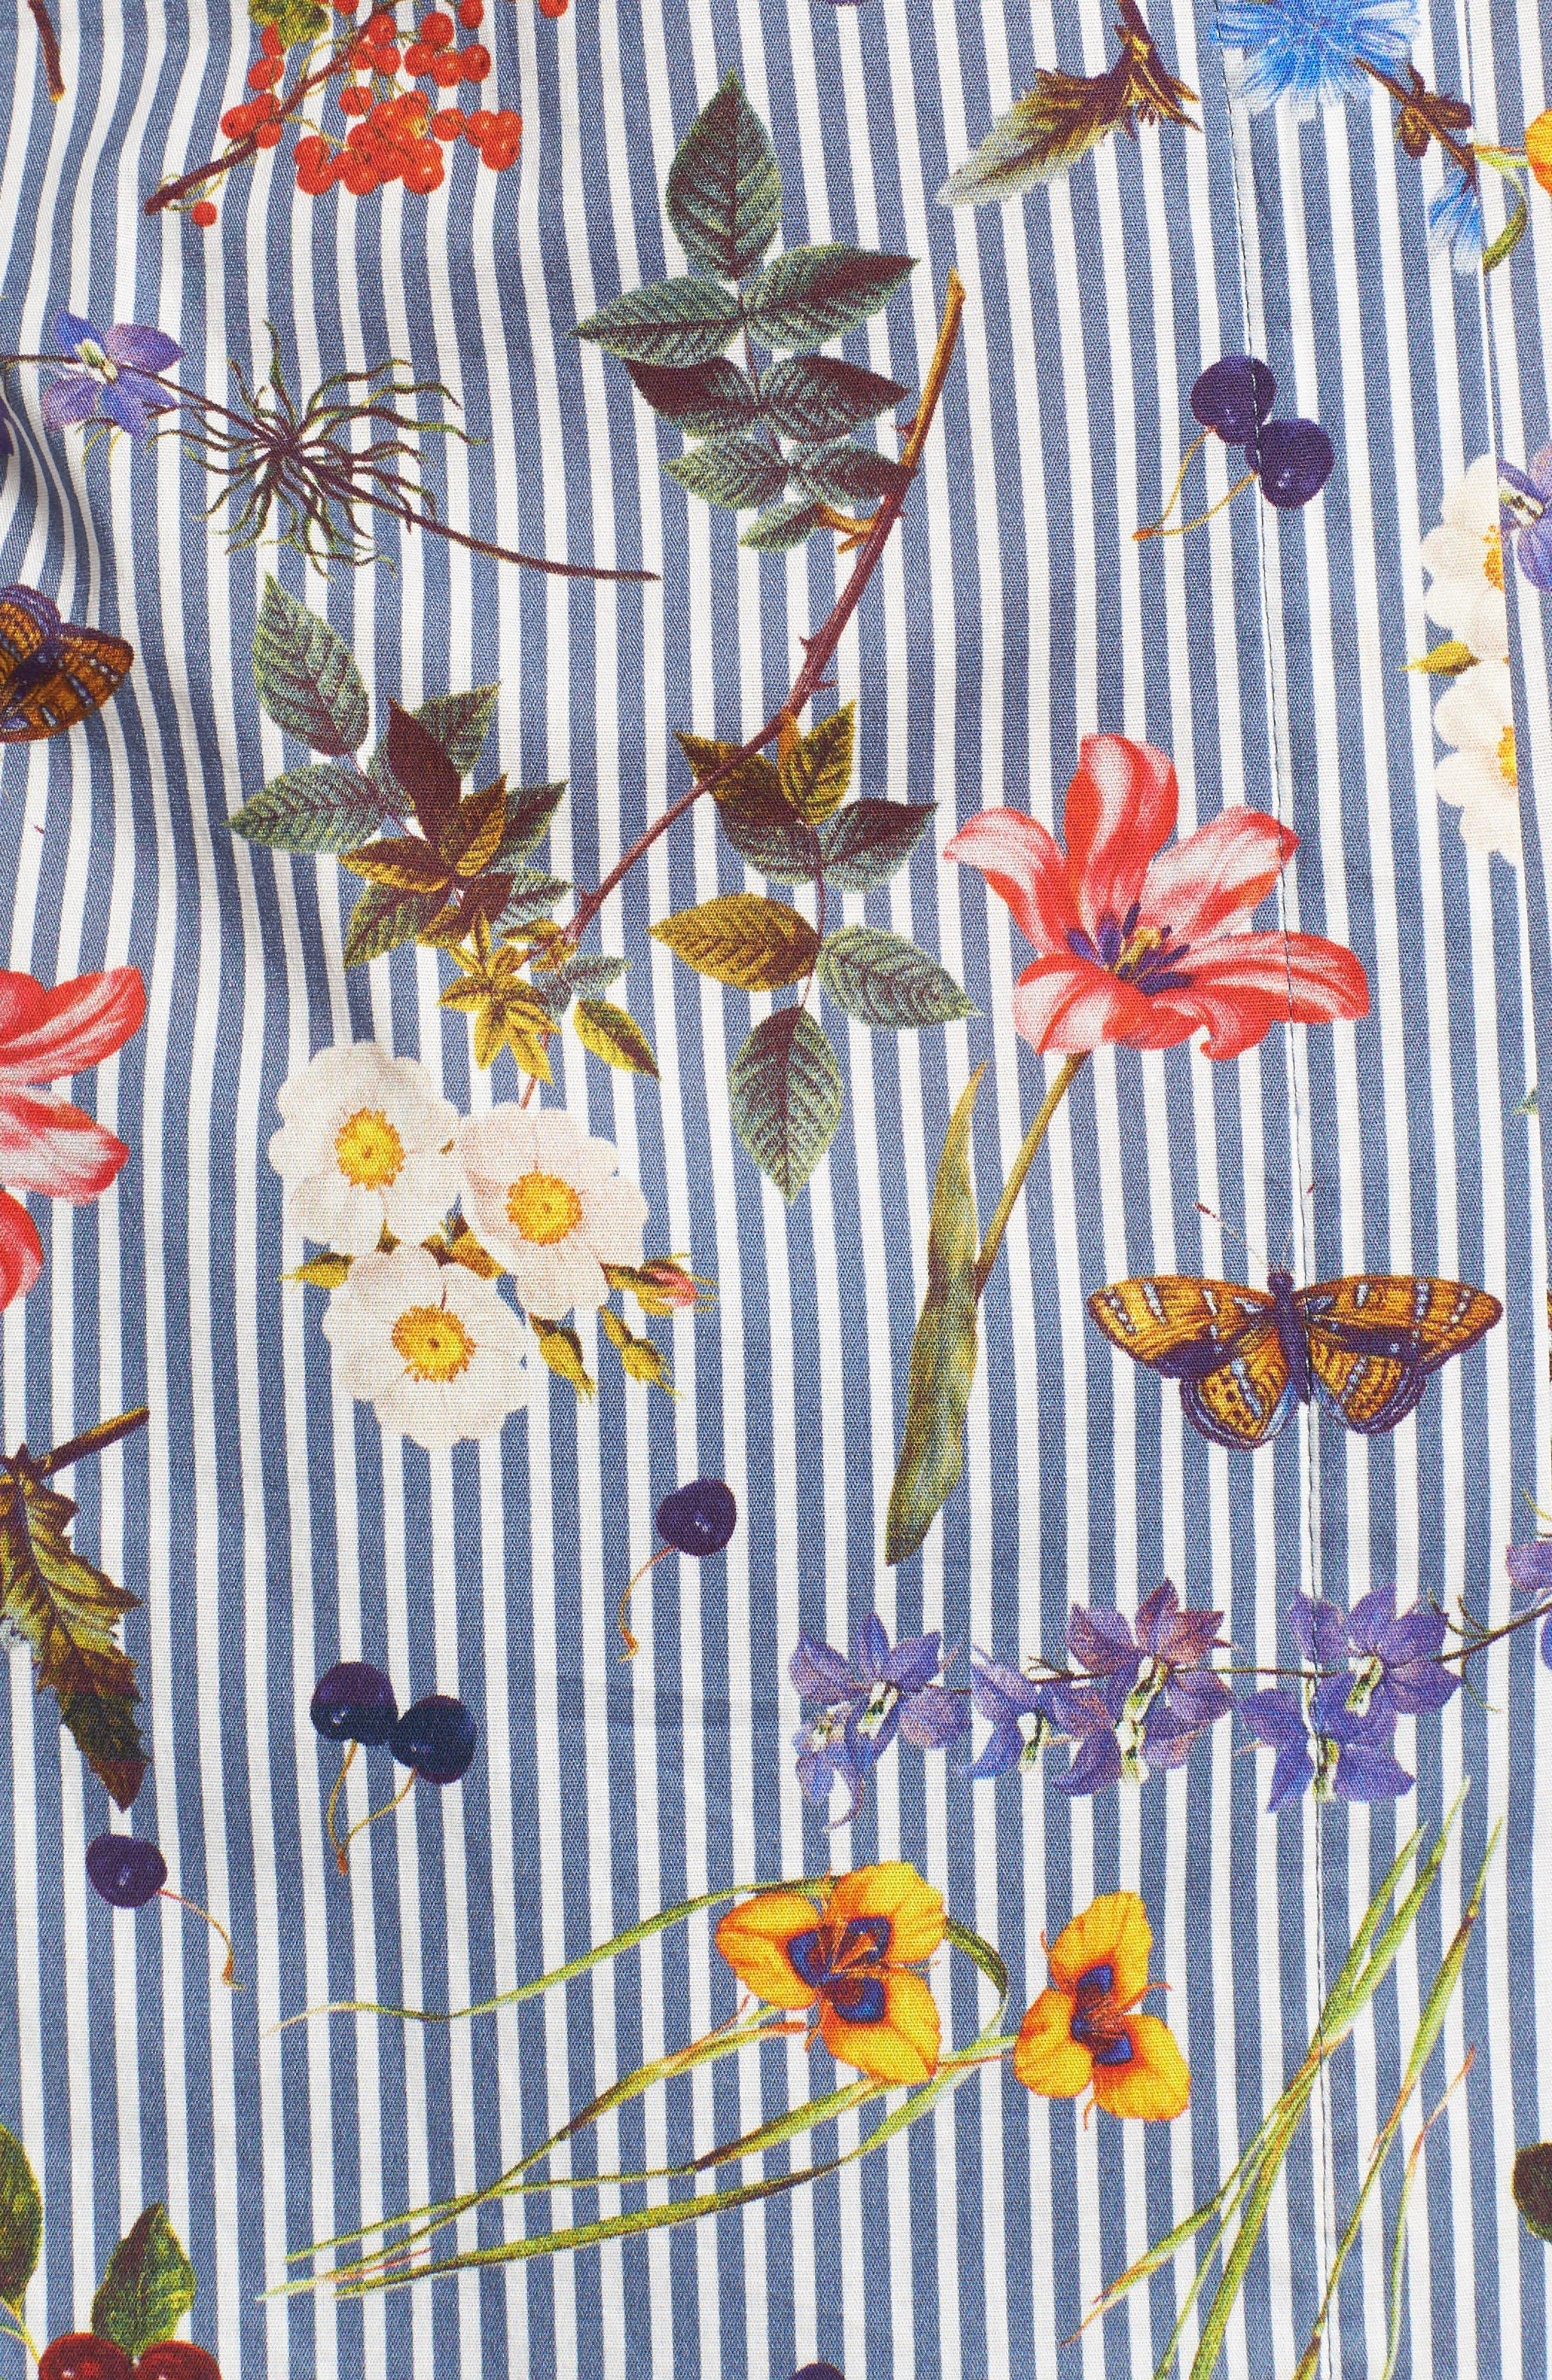 Horticulture Off the Shoulder Top,                             Alternate thumbnail 6, color,                             Botanical Stripe/ Multi